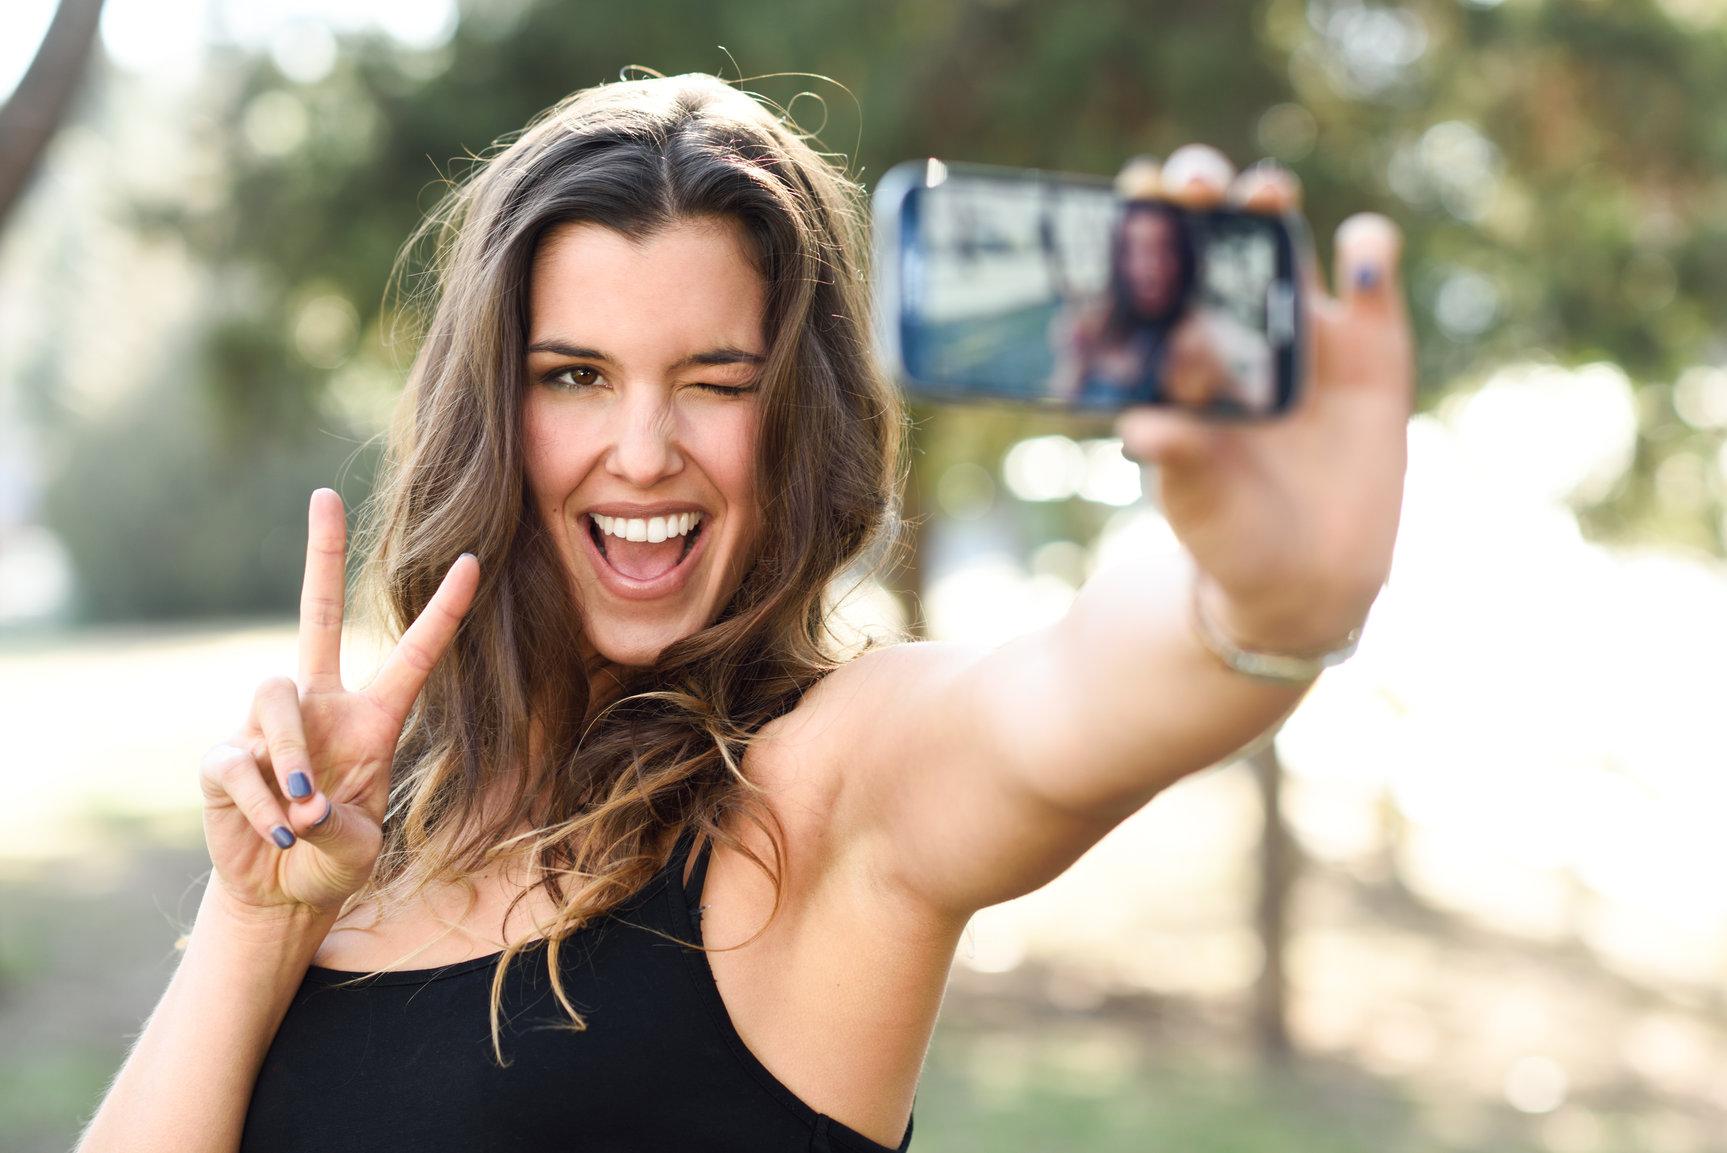 social media and its harm on self esteem